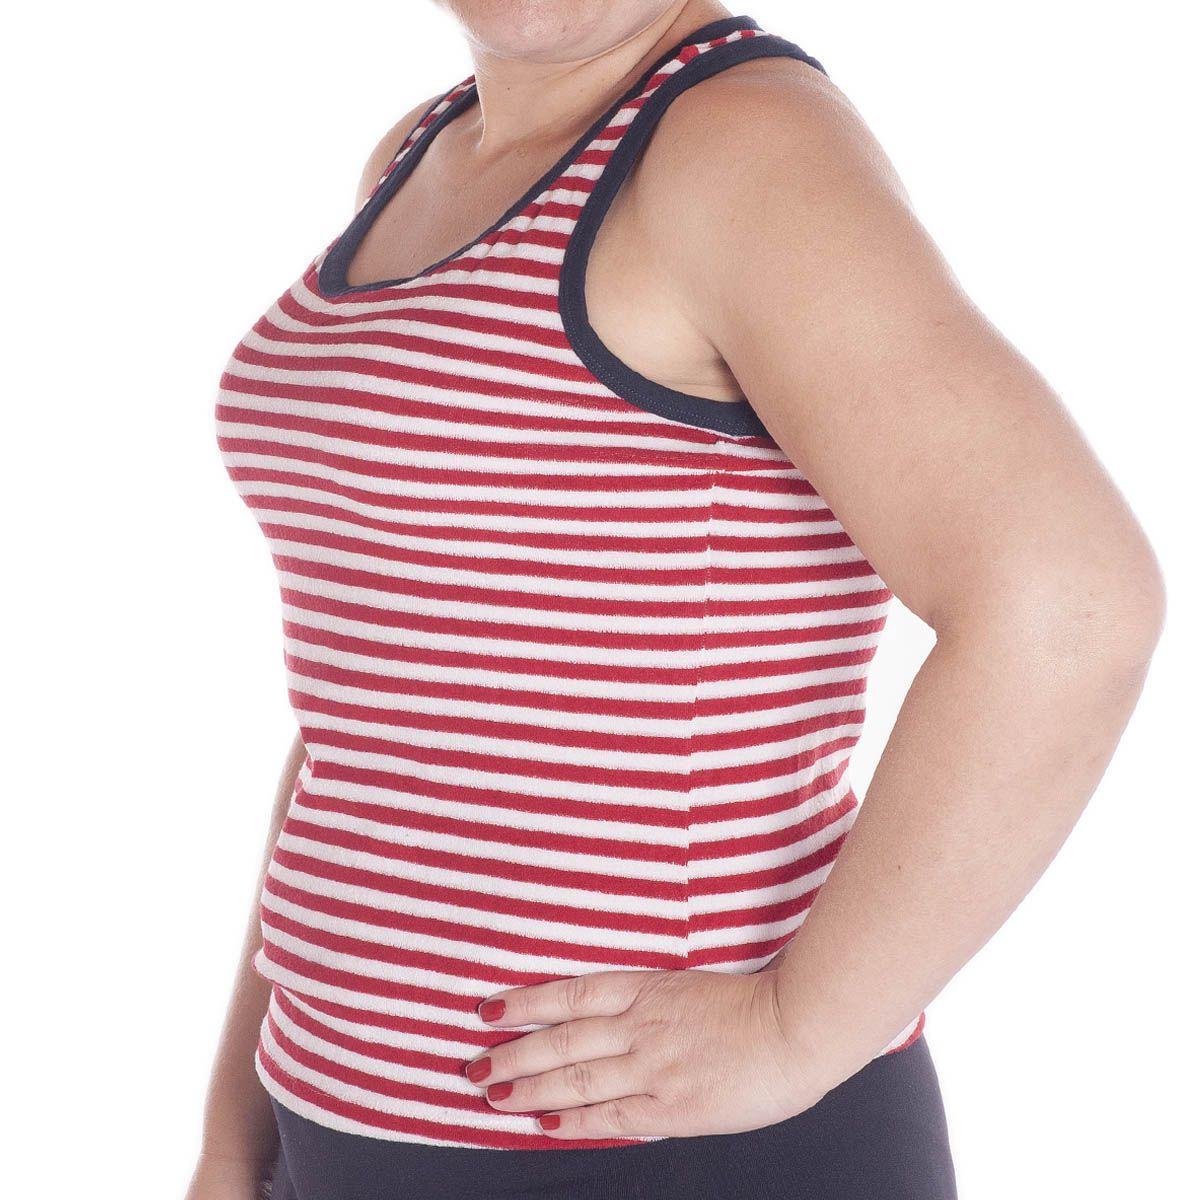 Camiseta Regata Feminina Nadador  -